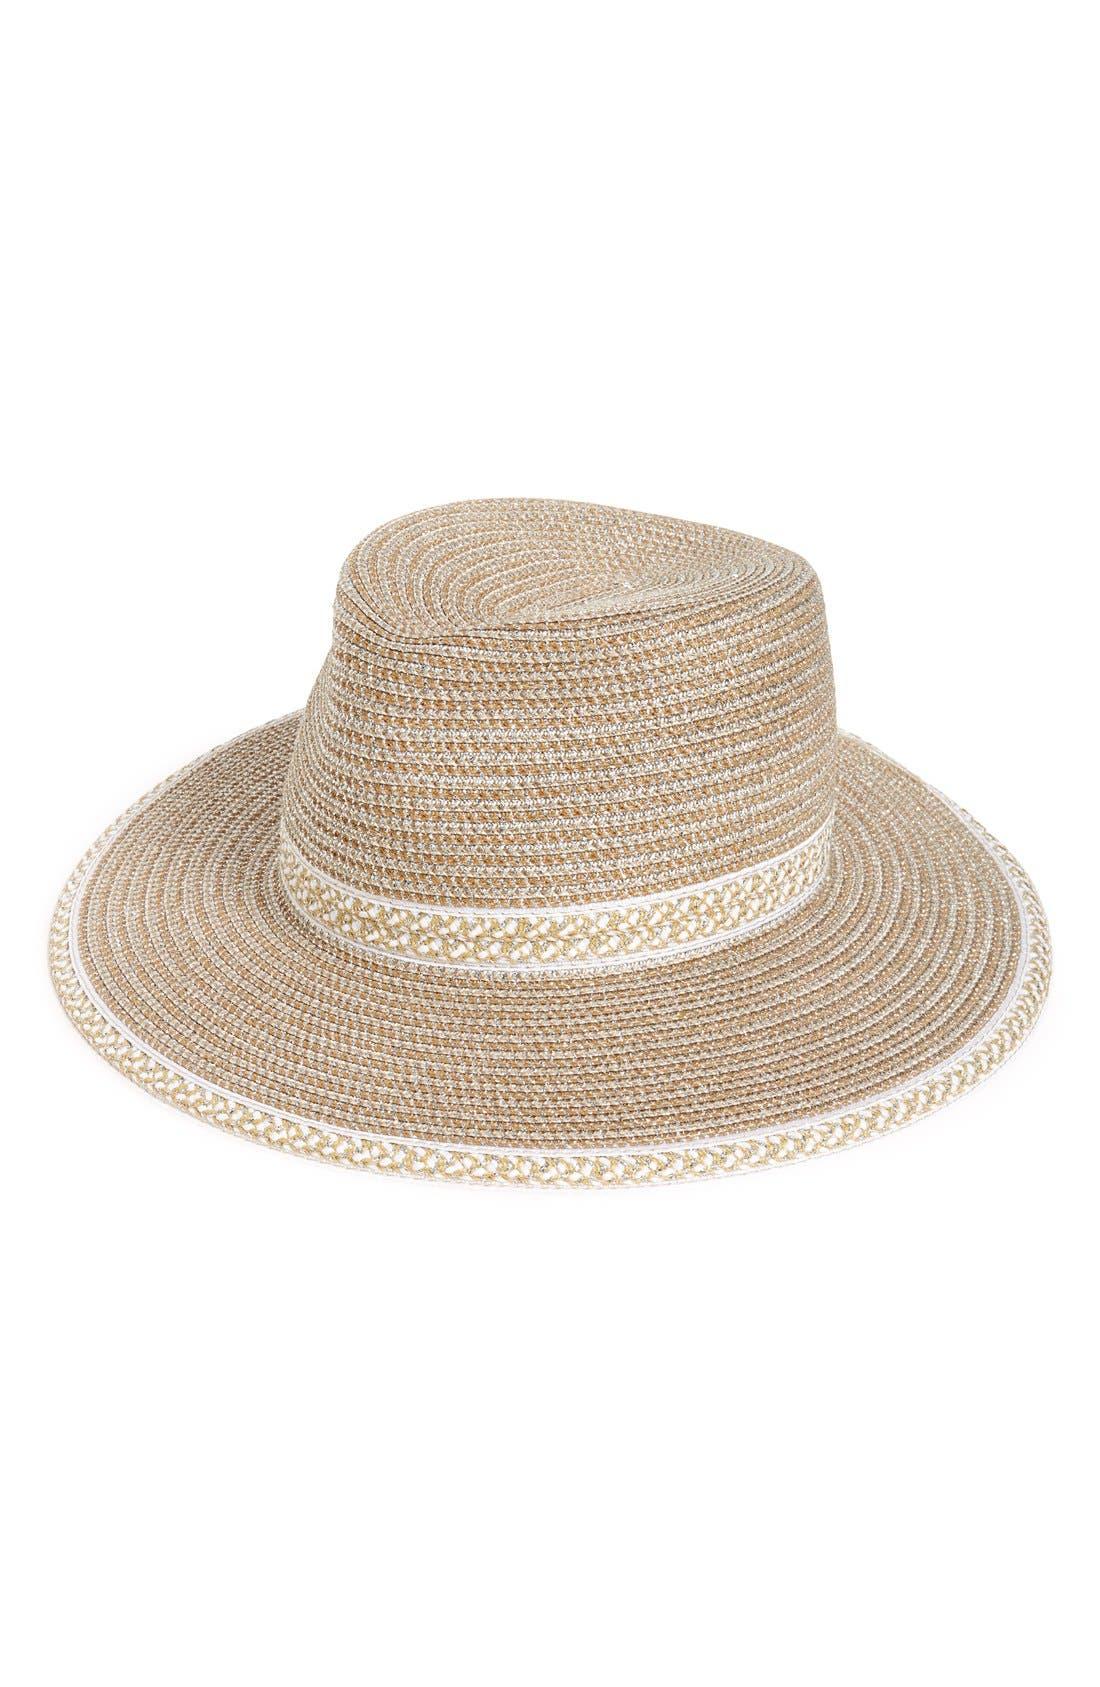 Main Image - Eric Javits 'Georgia' Woven Hat